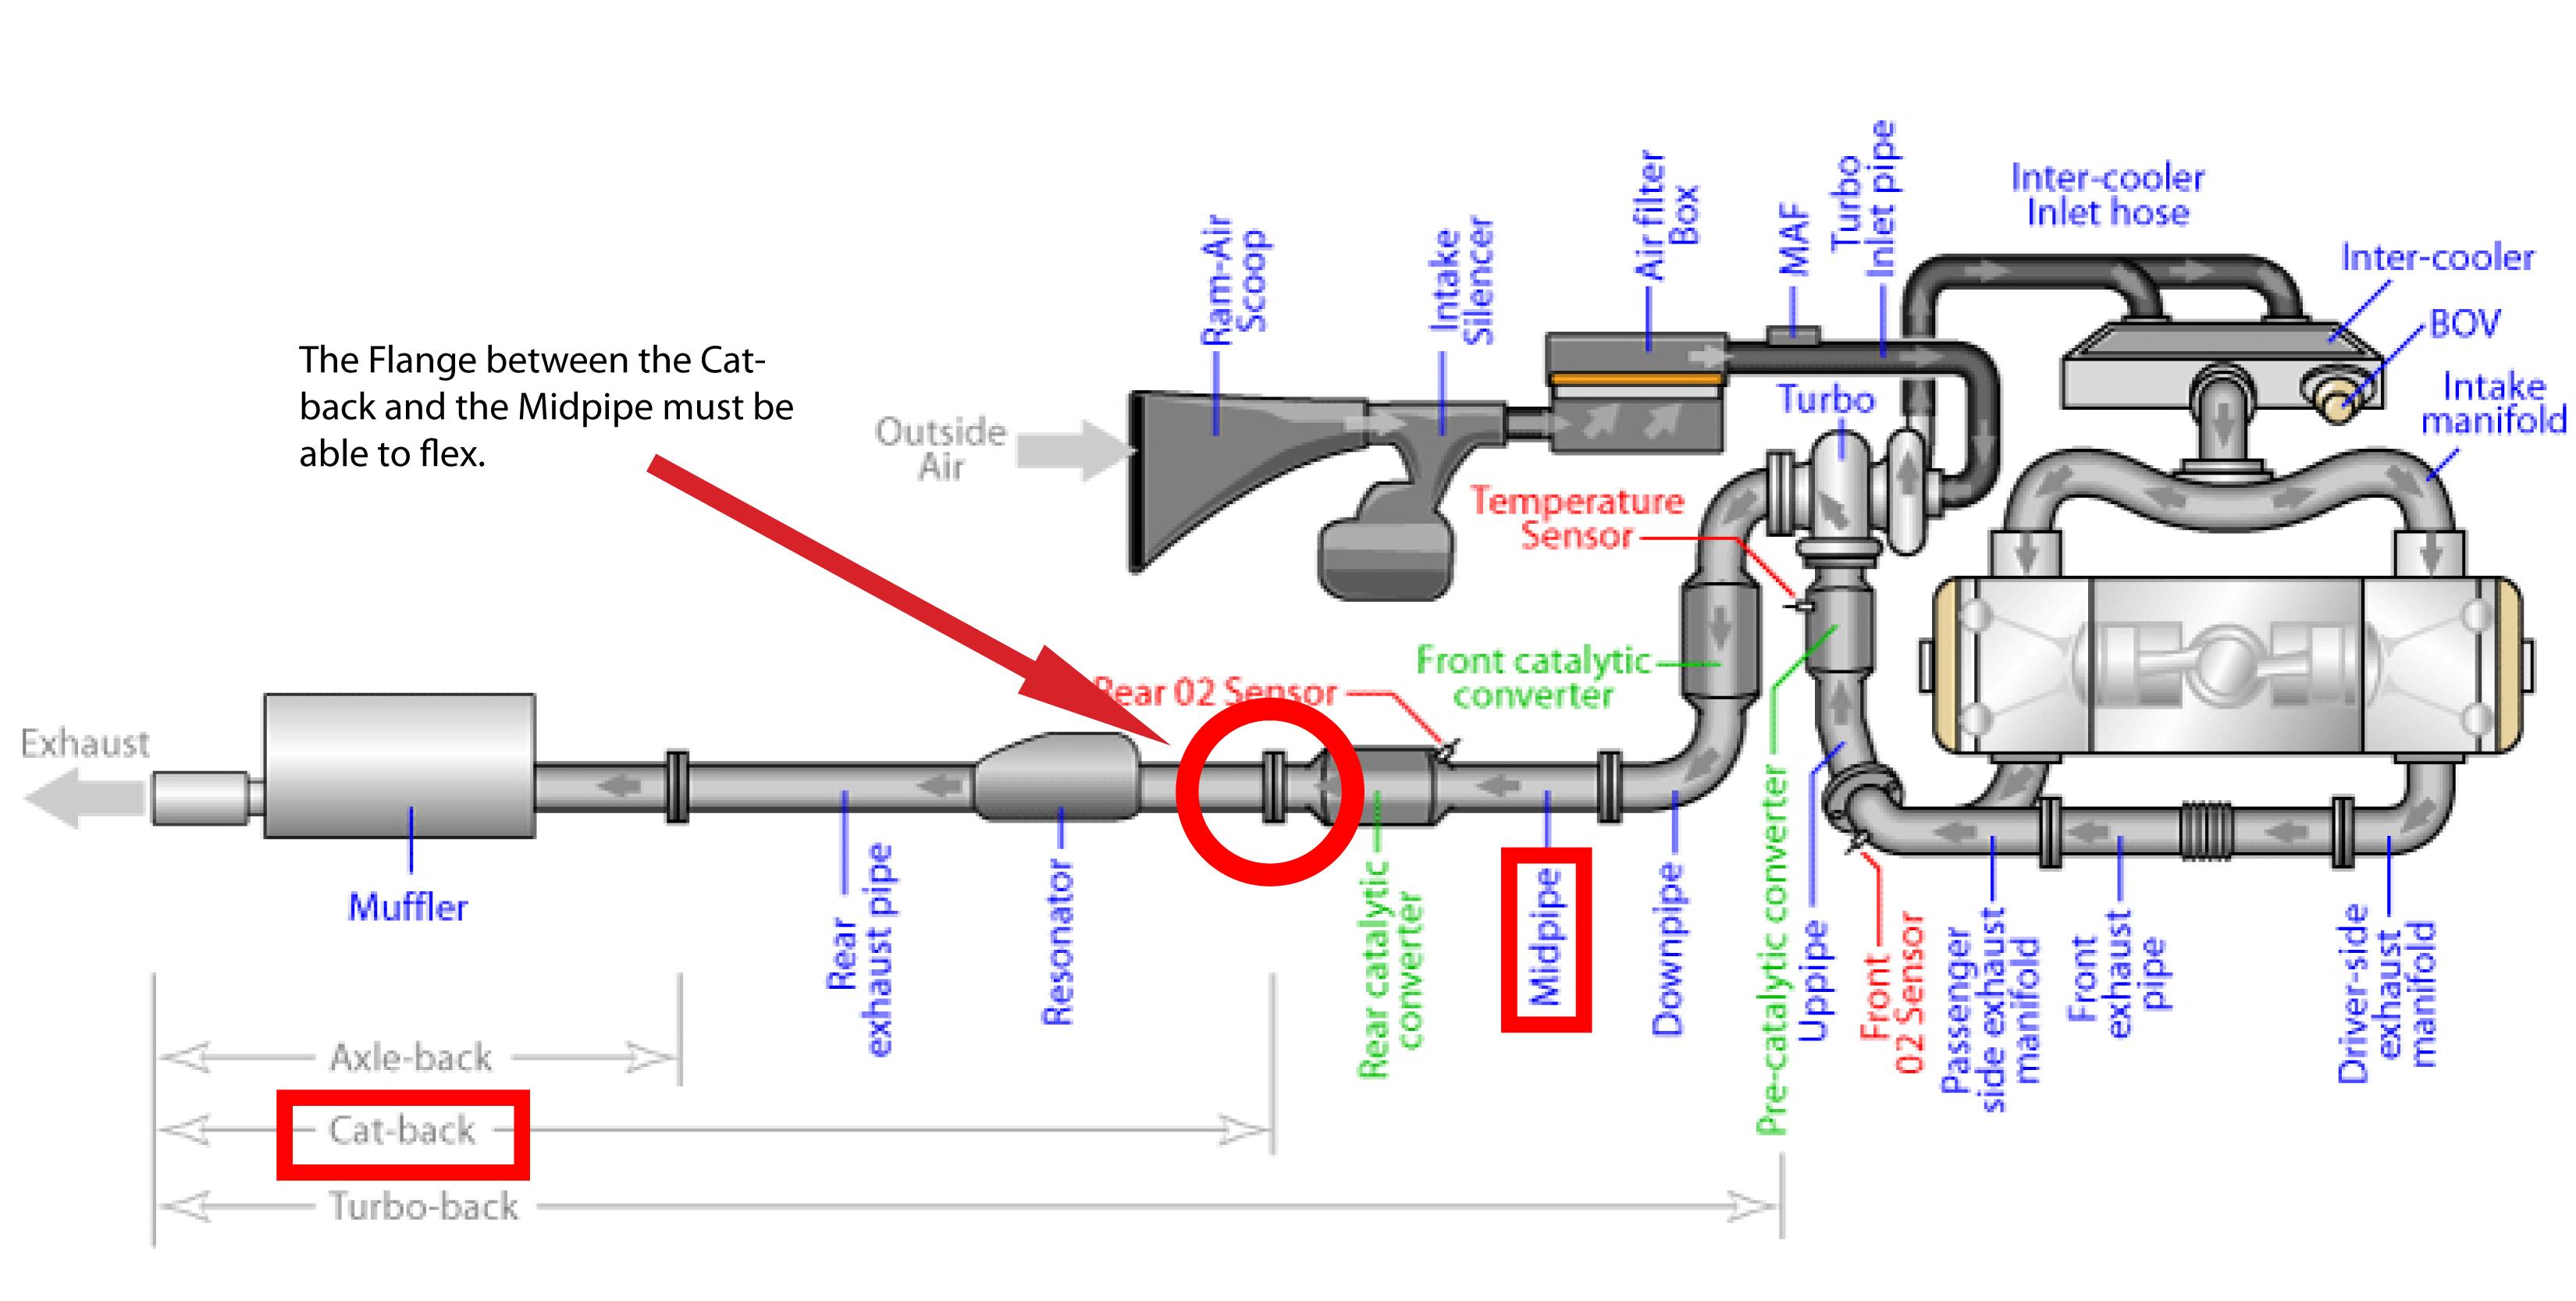 2003 subaru wrx exhaust diagram further 2008 subaru impreza rear 2002 subaru wrx exhaust diagram 2002 subaru wrx exhaust diagram [ 3300 x 1667 Pixel ]